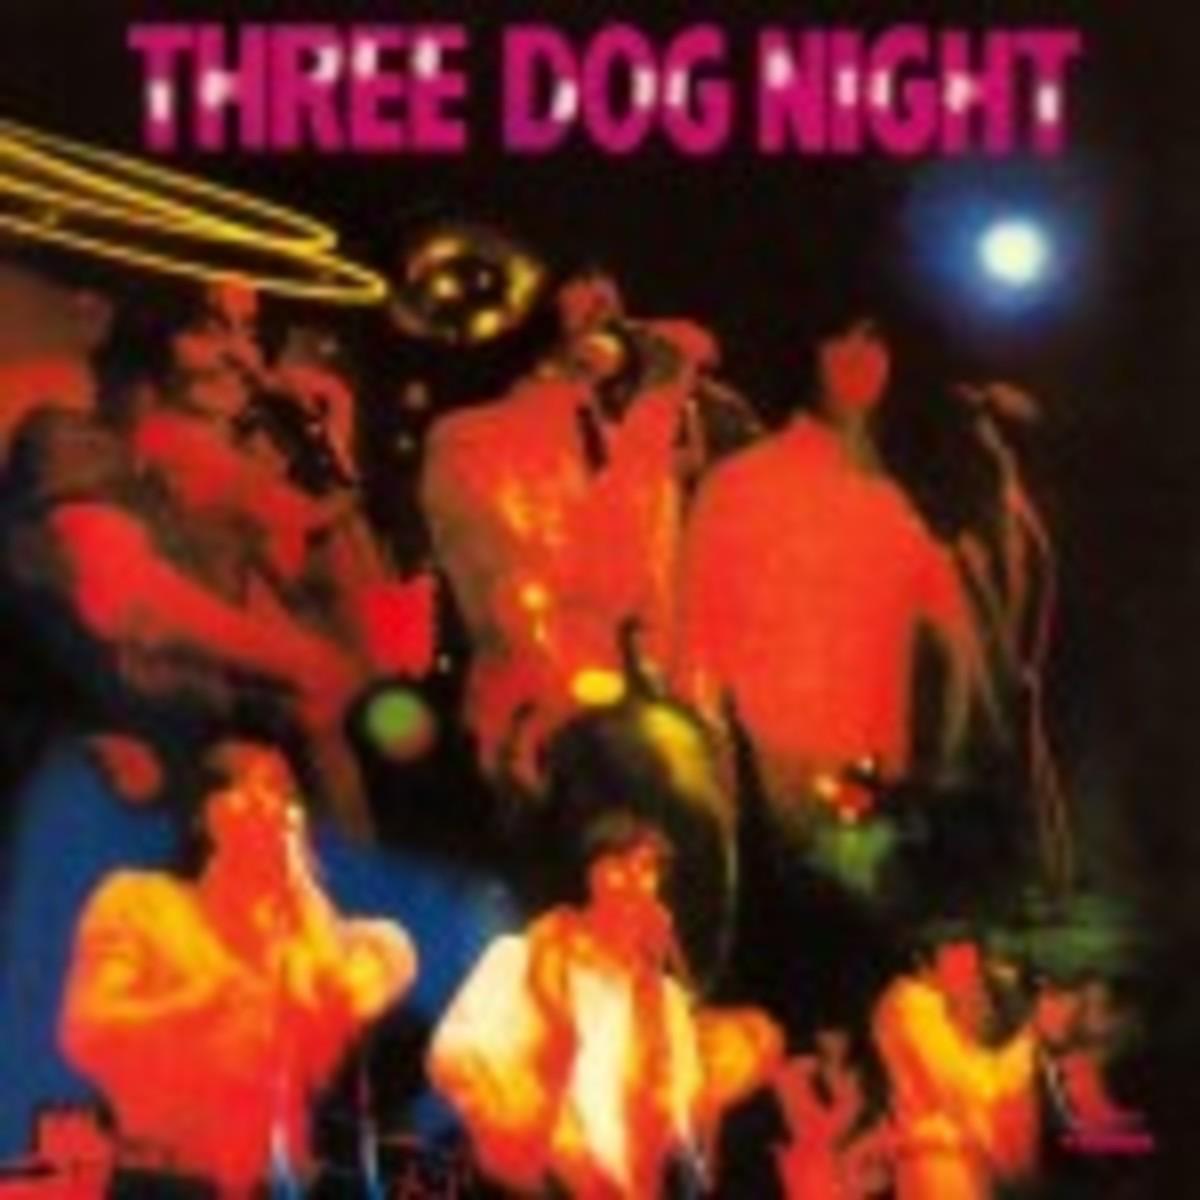 three-dog-night-one